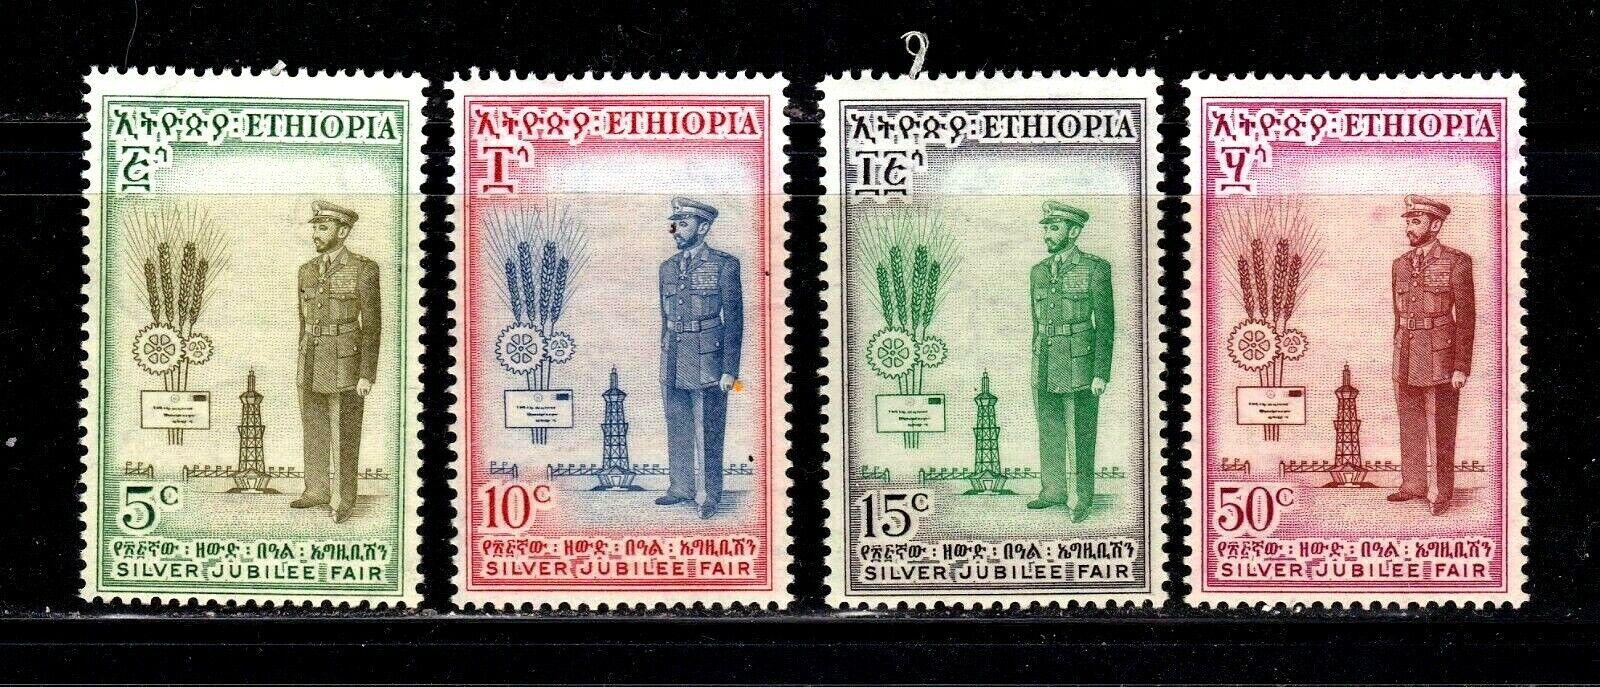 Ethiopia Stamps 351 - 354, MHOG, VVF, Complete Set, 1955 - $5.00